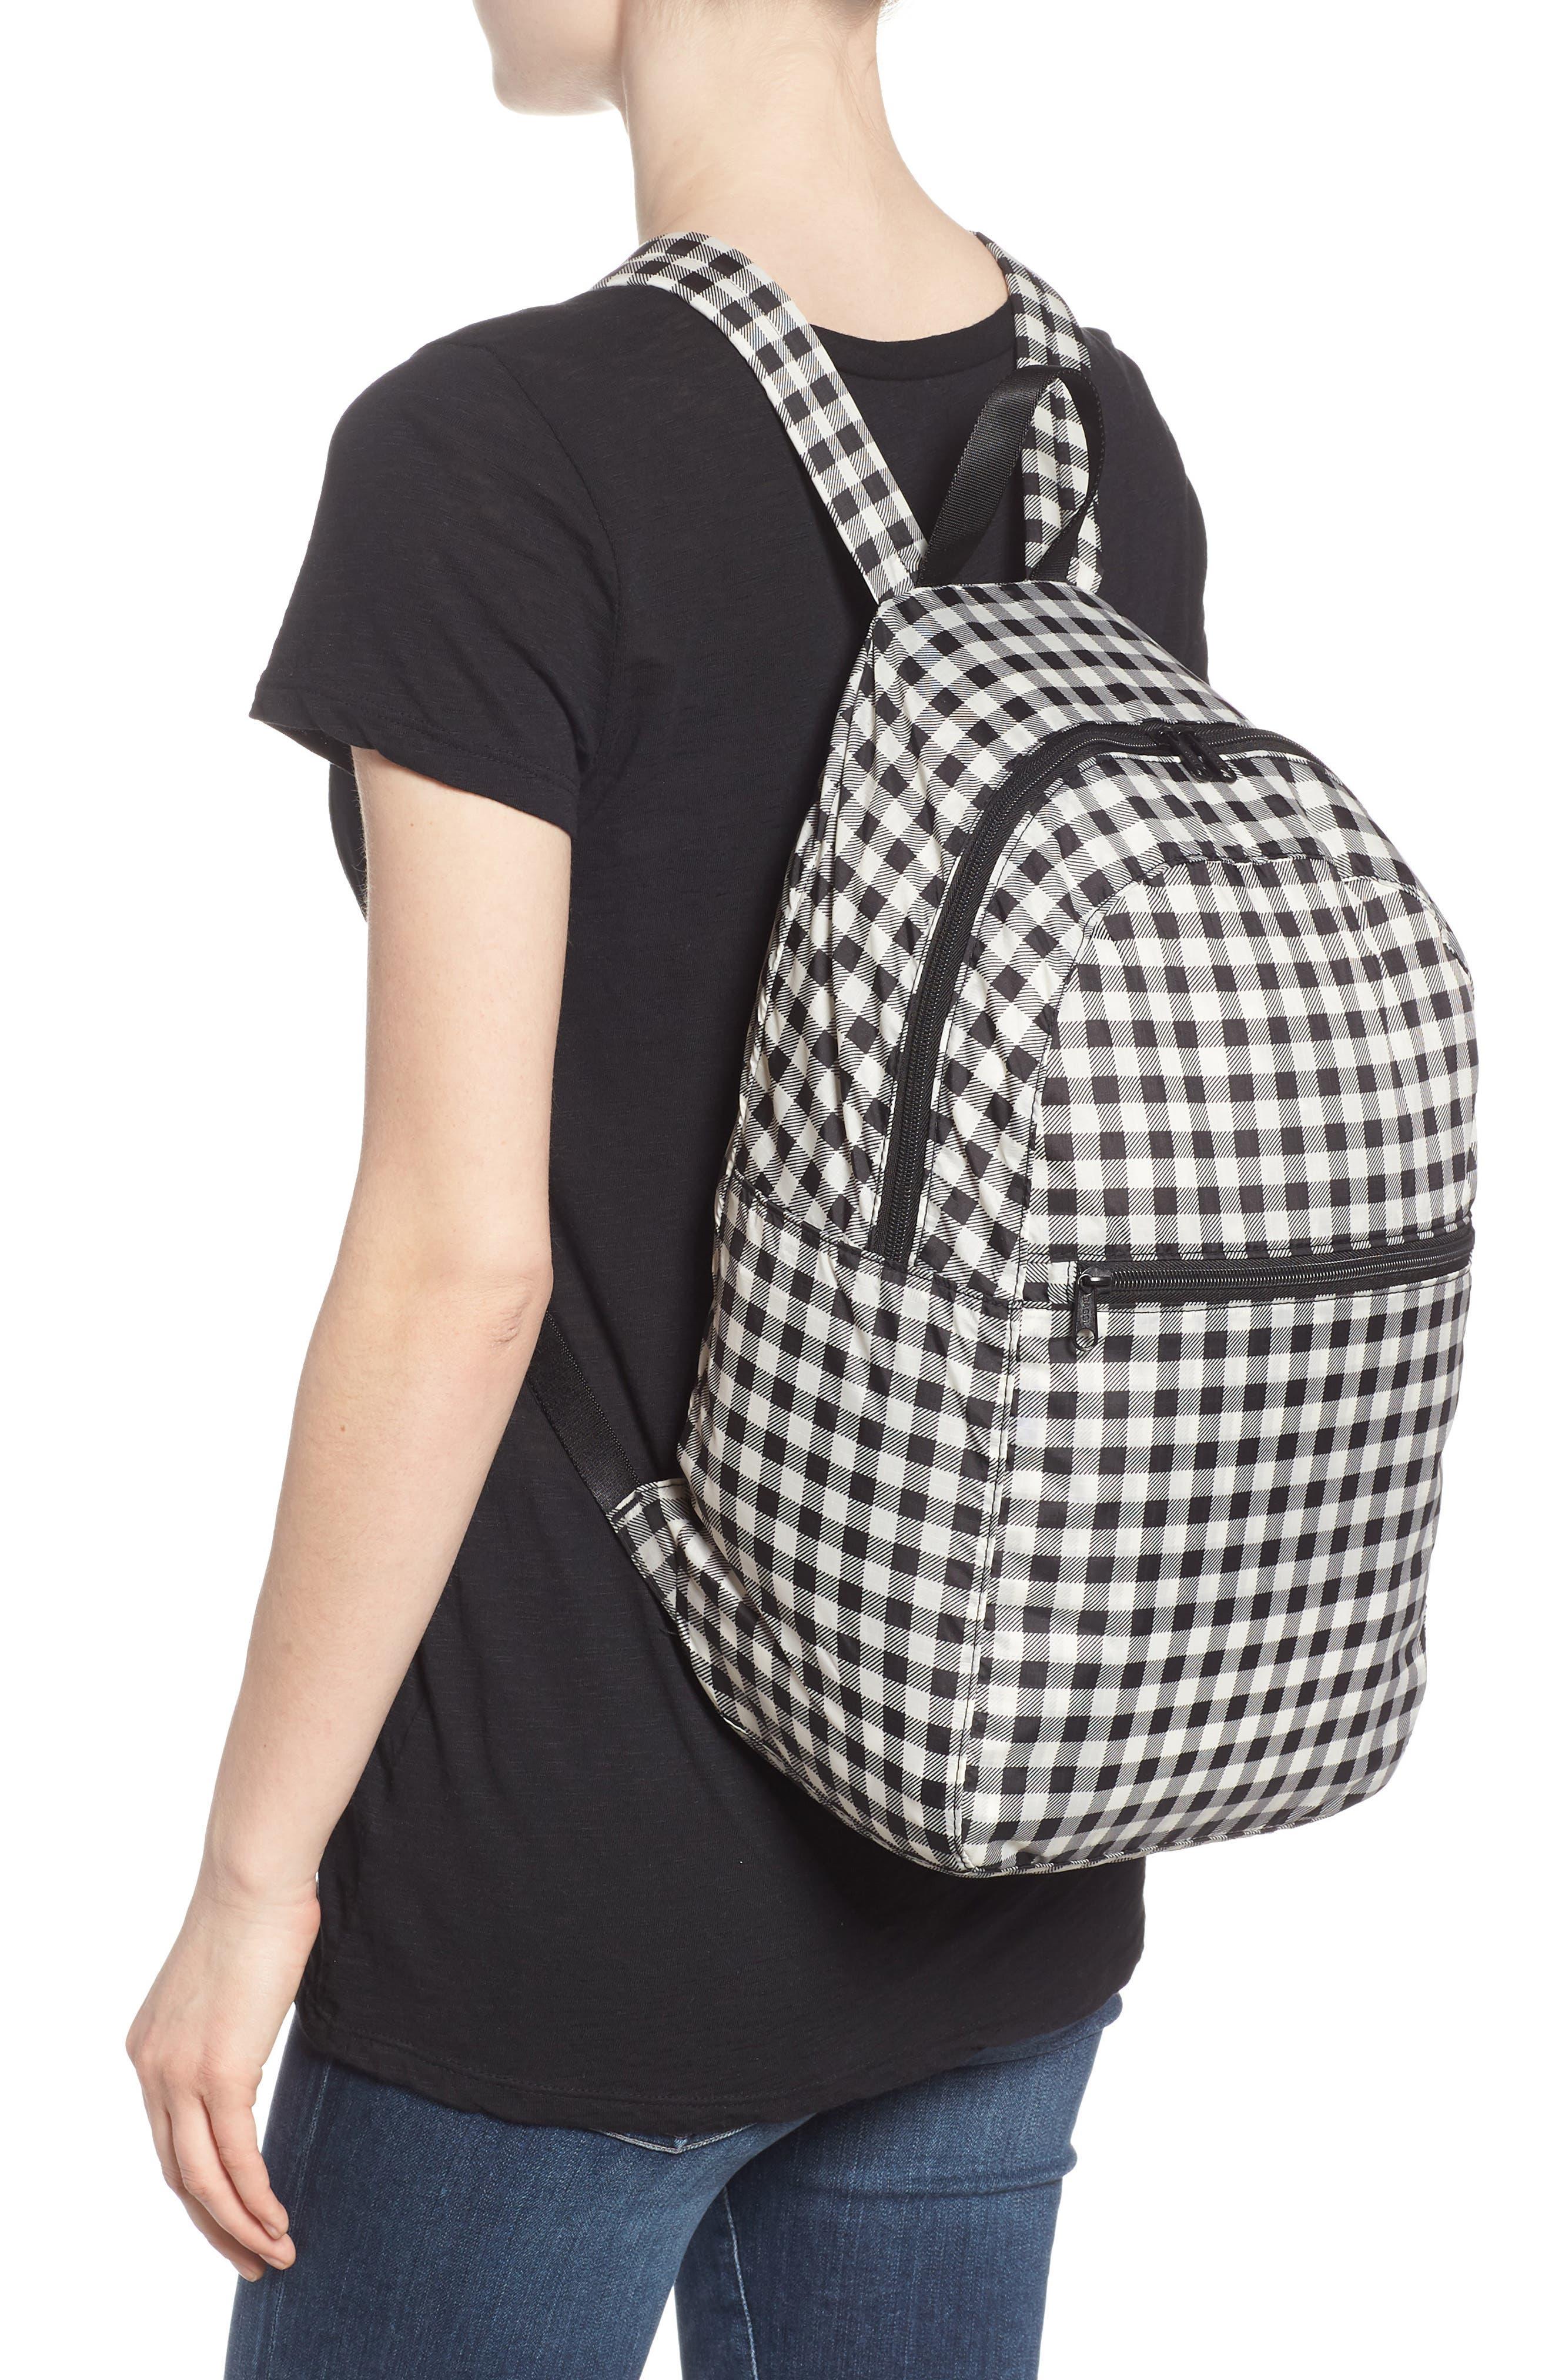 Ripstop Nylon Backpack,                             Alternate thumbnail 2, color,                             006